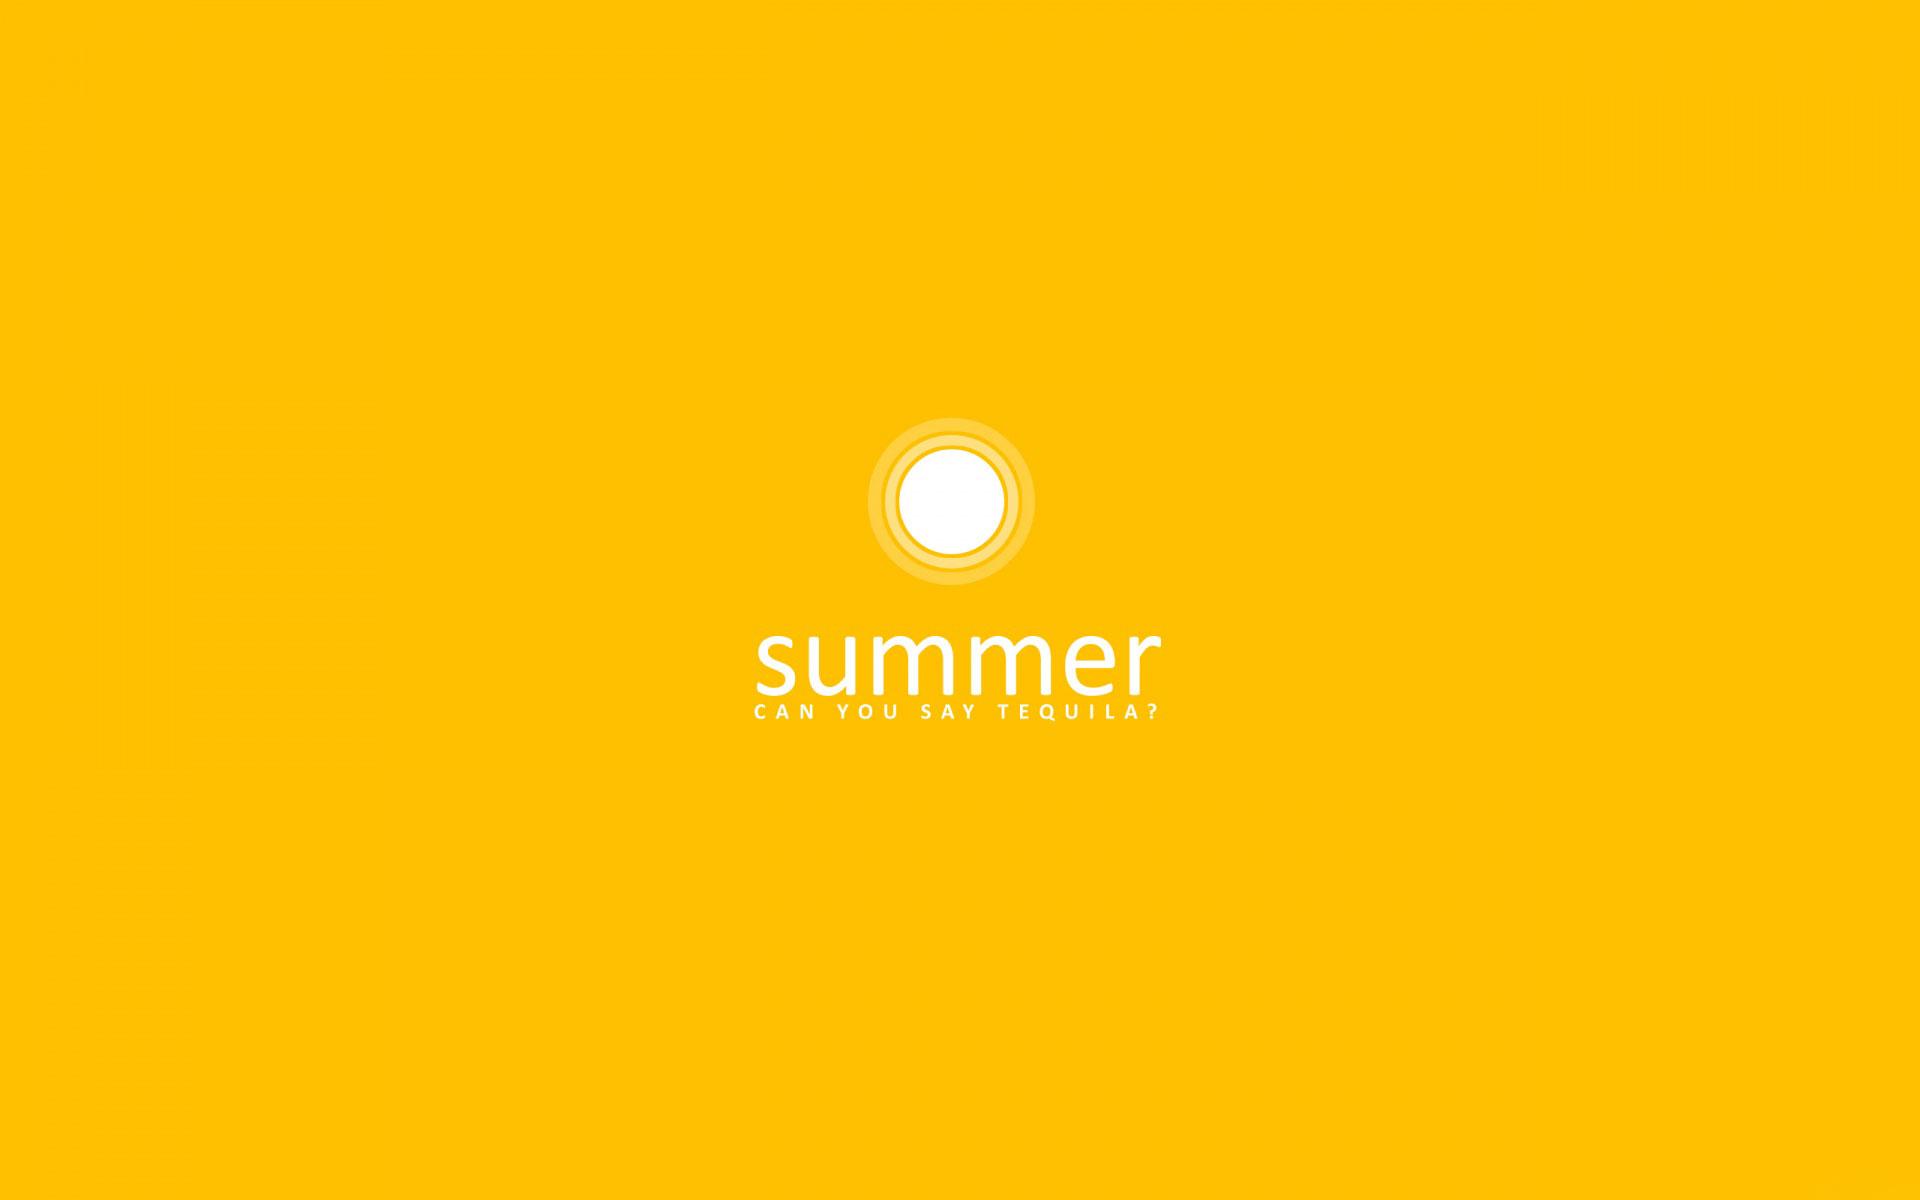 2932x2932 Pubg Android Game 4k Ipad Pro Retina Display Hd: Summer Minimalism, HD Artist, 4k Wallpapers, Images